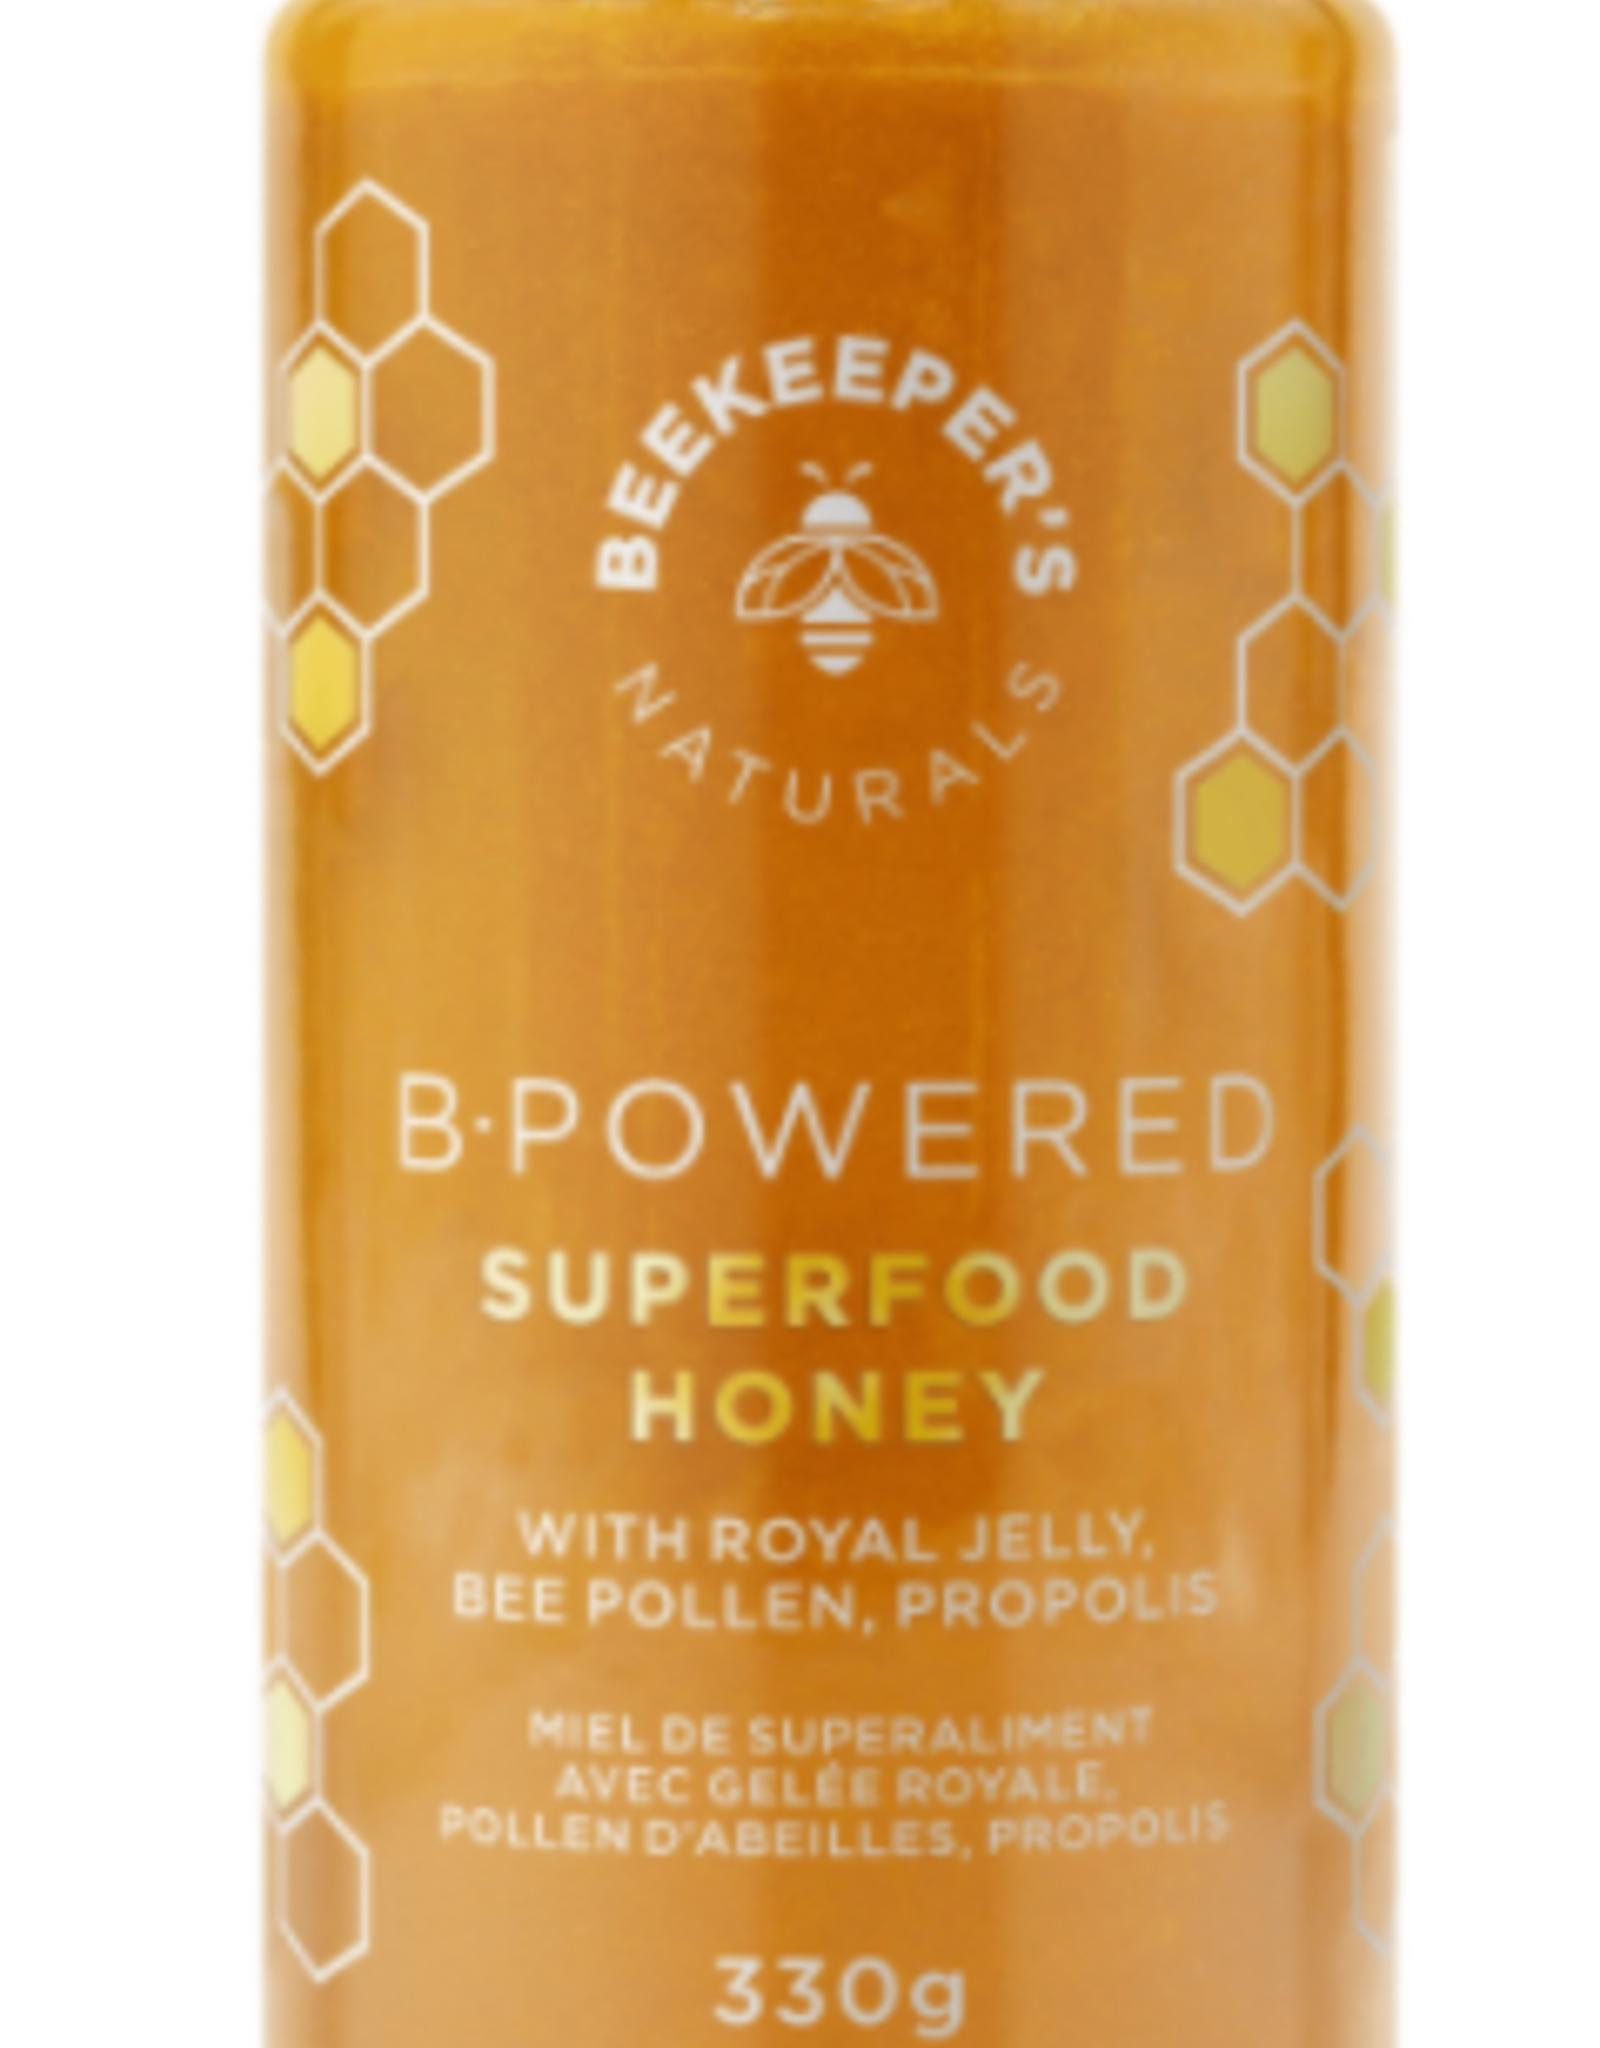 Beekeepers - Superfood Honey, B-Powered (330g)